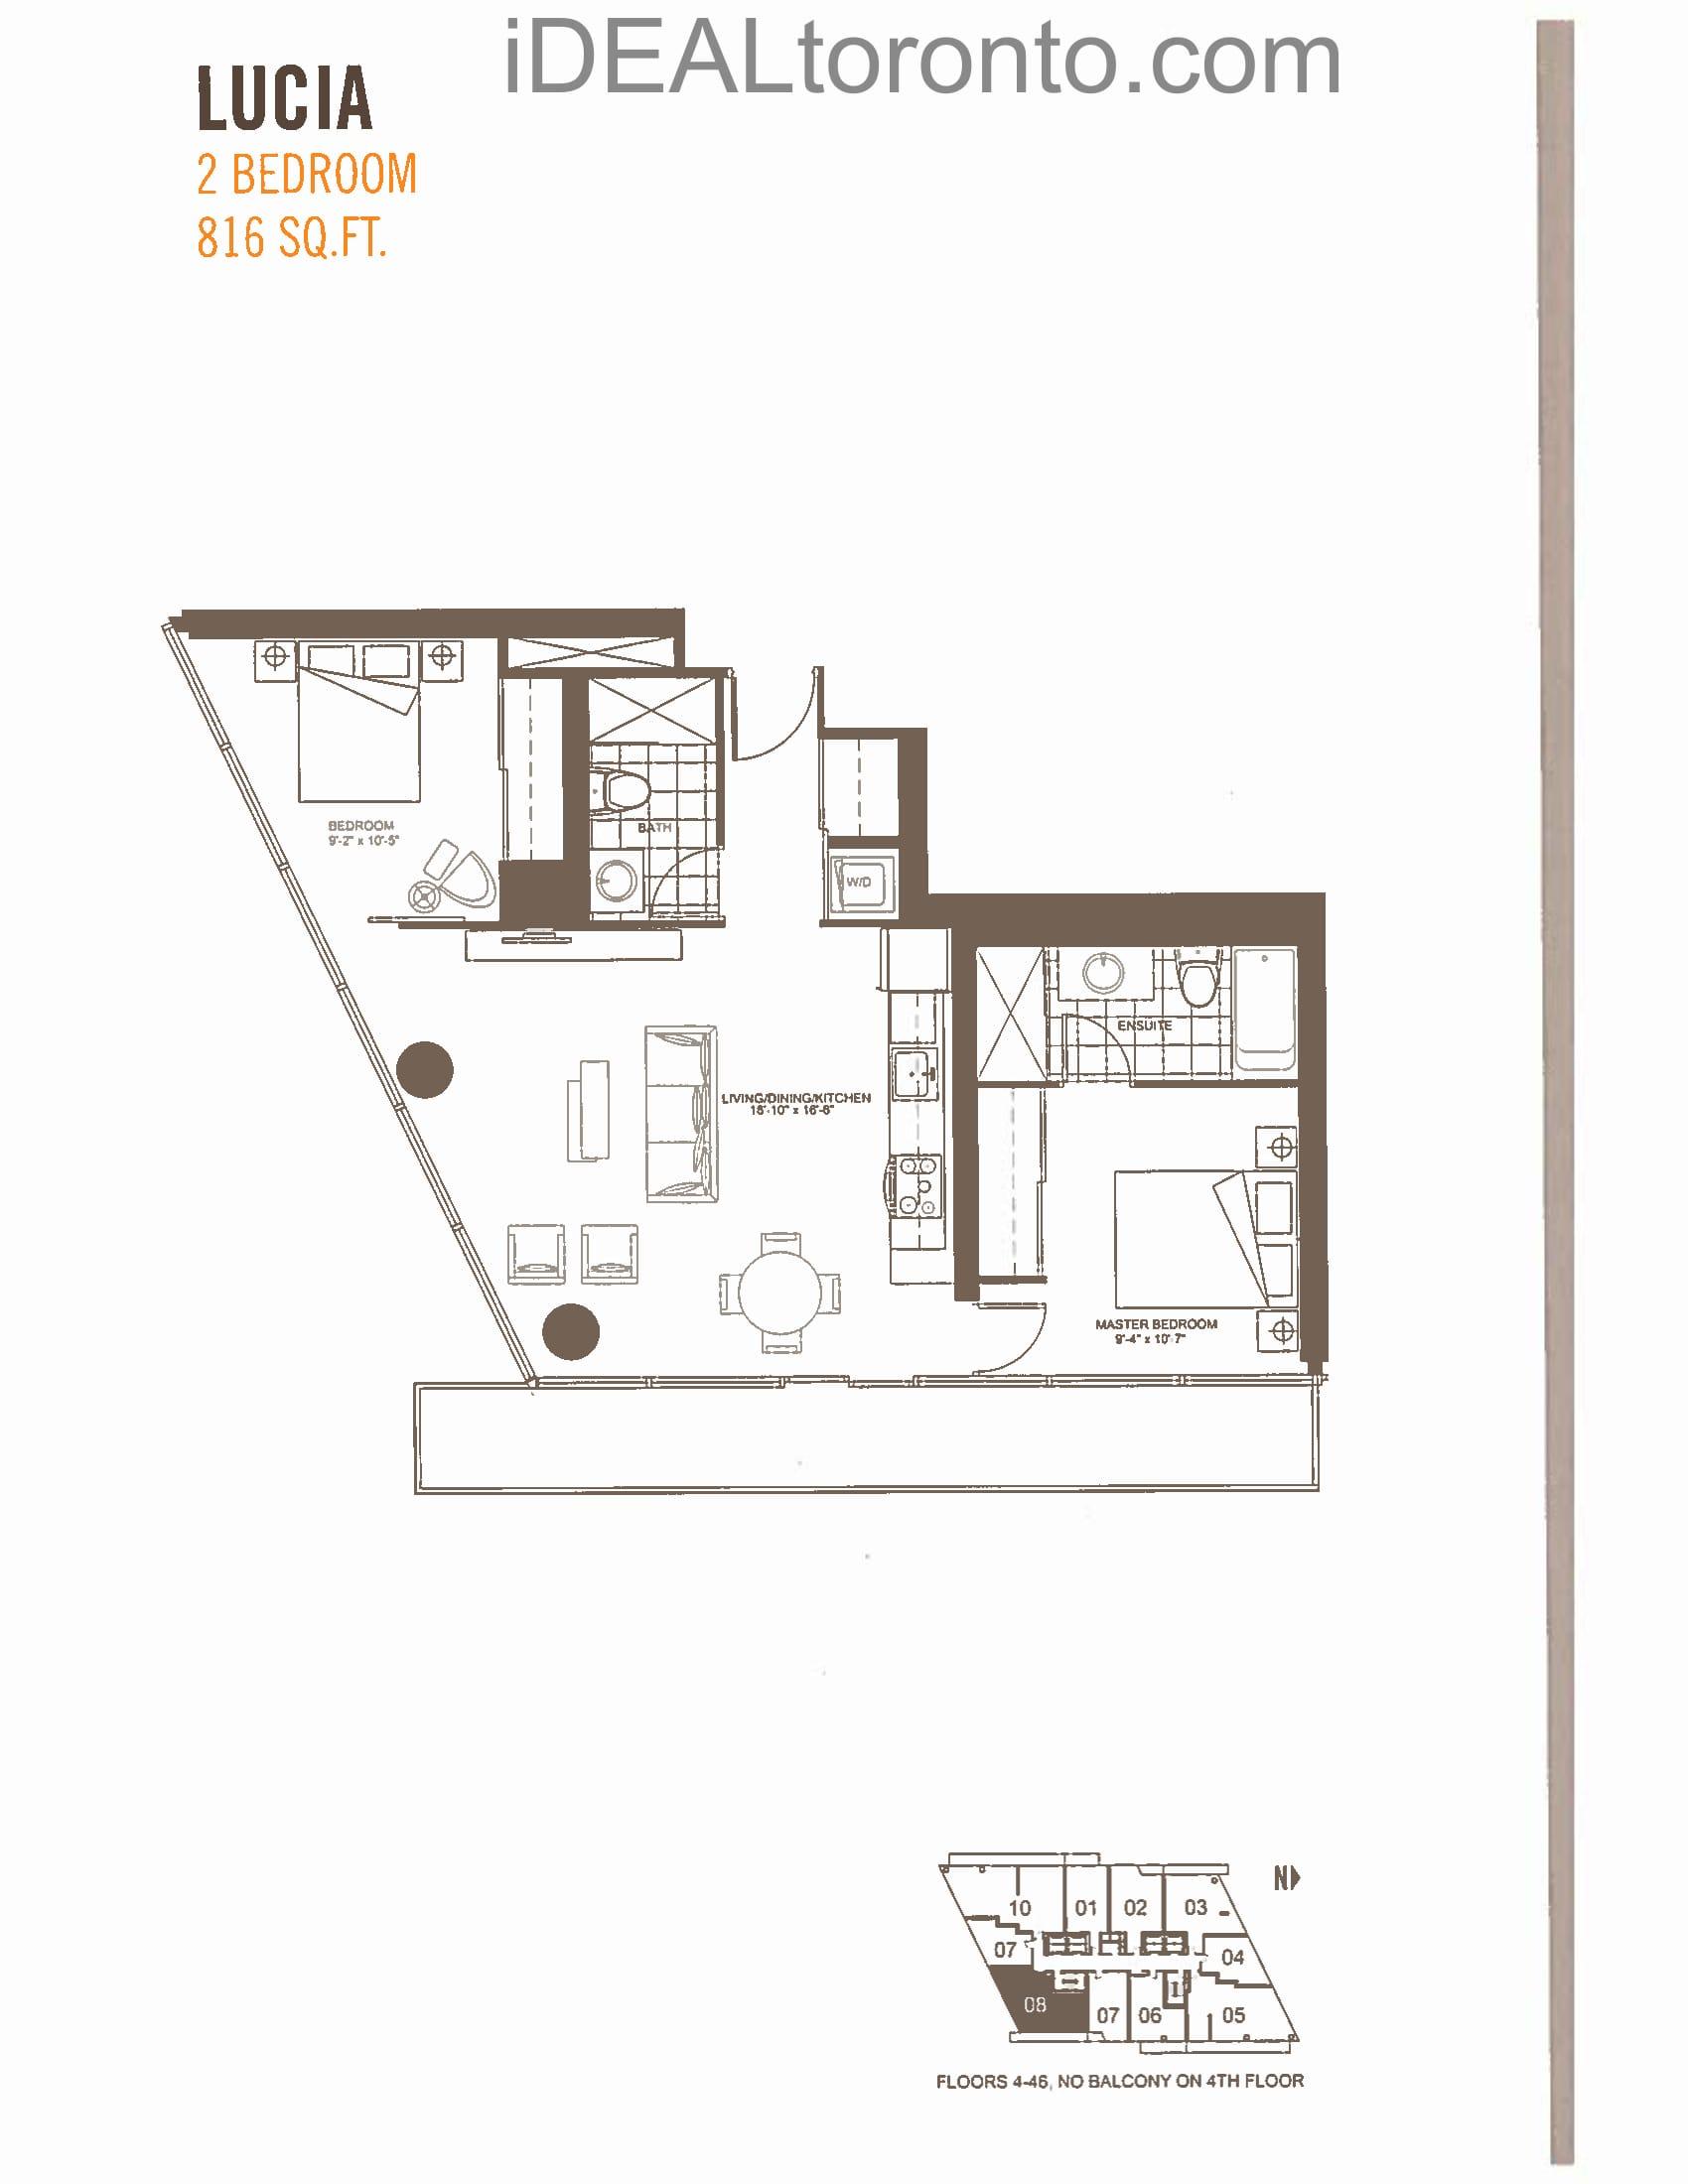 Lucia: 2 Bedroom,SE, 816 SqFt